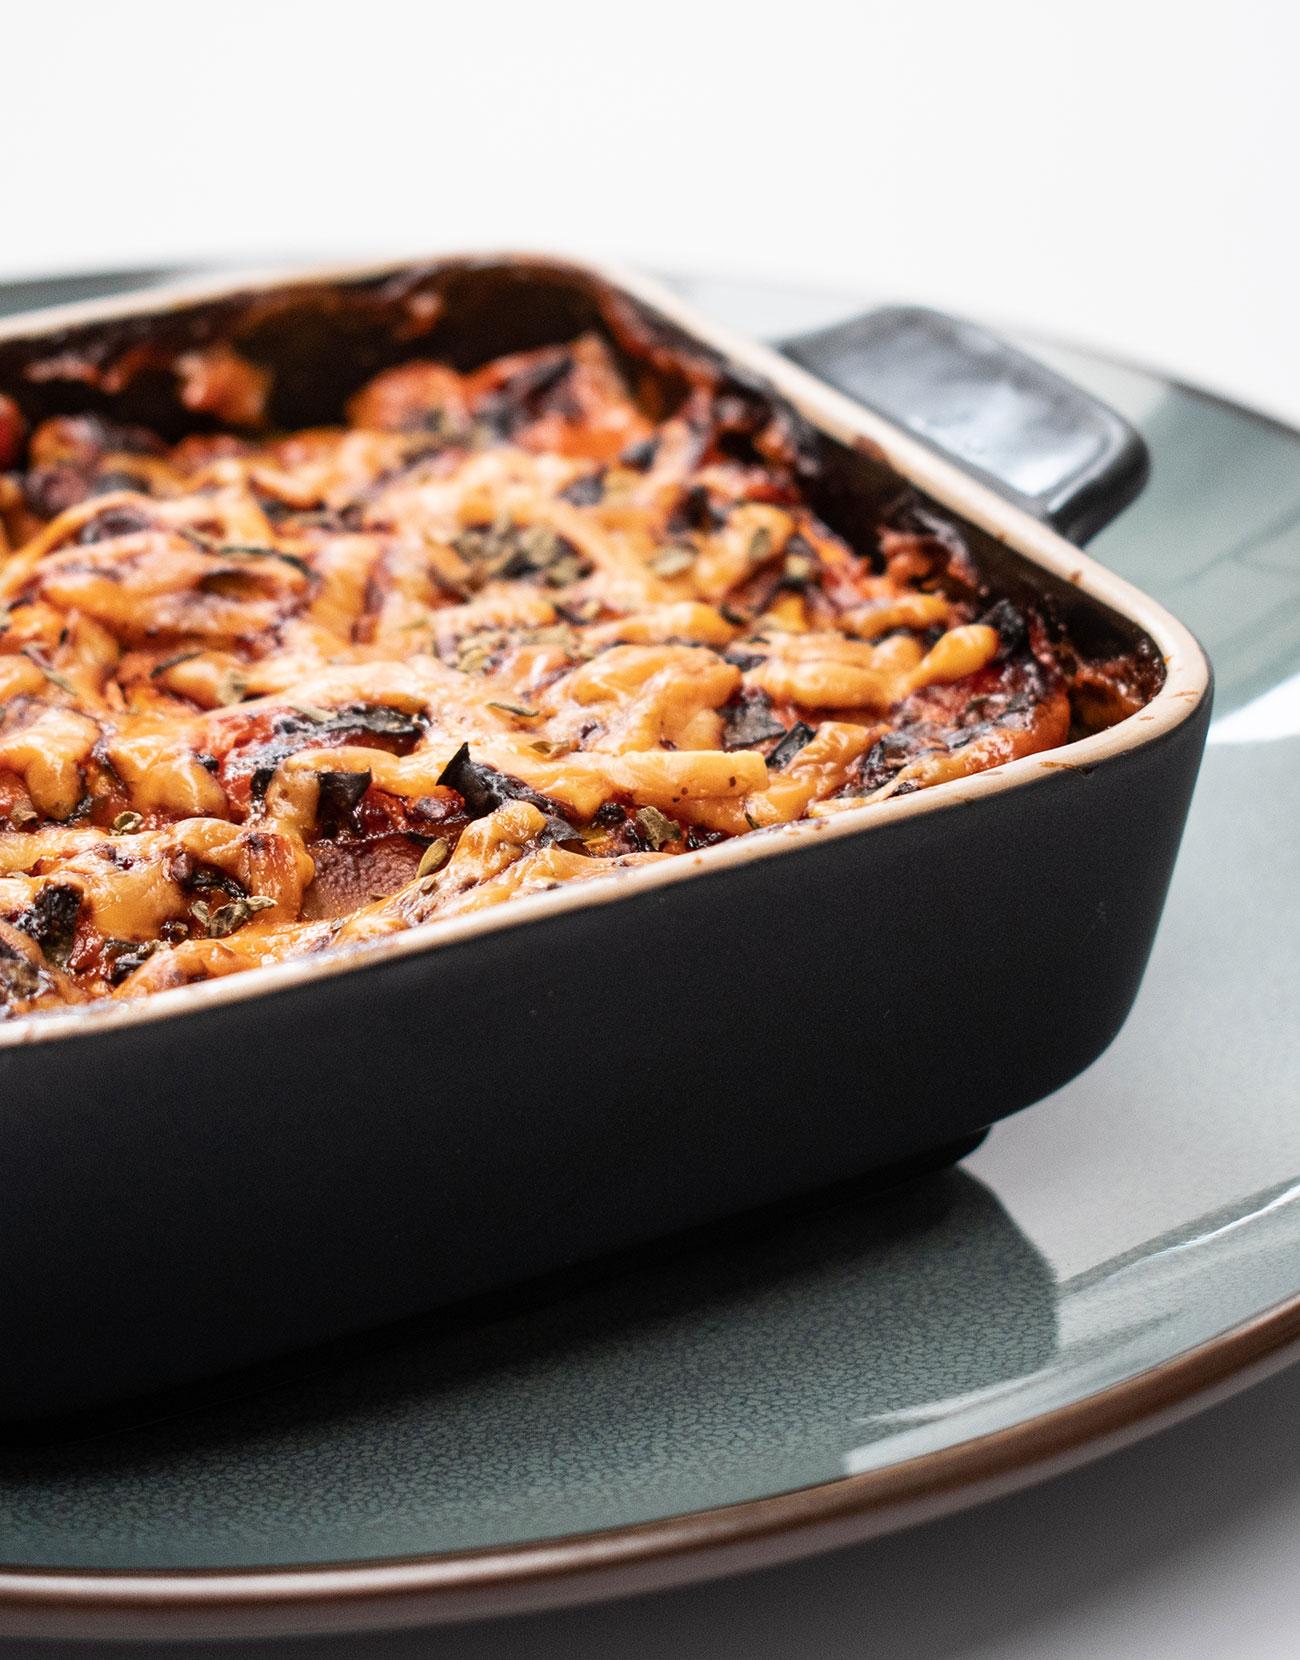 volkoren lasagne met gerookte zalm airfryer